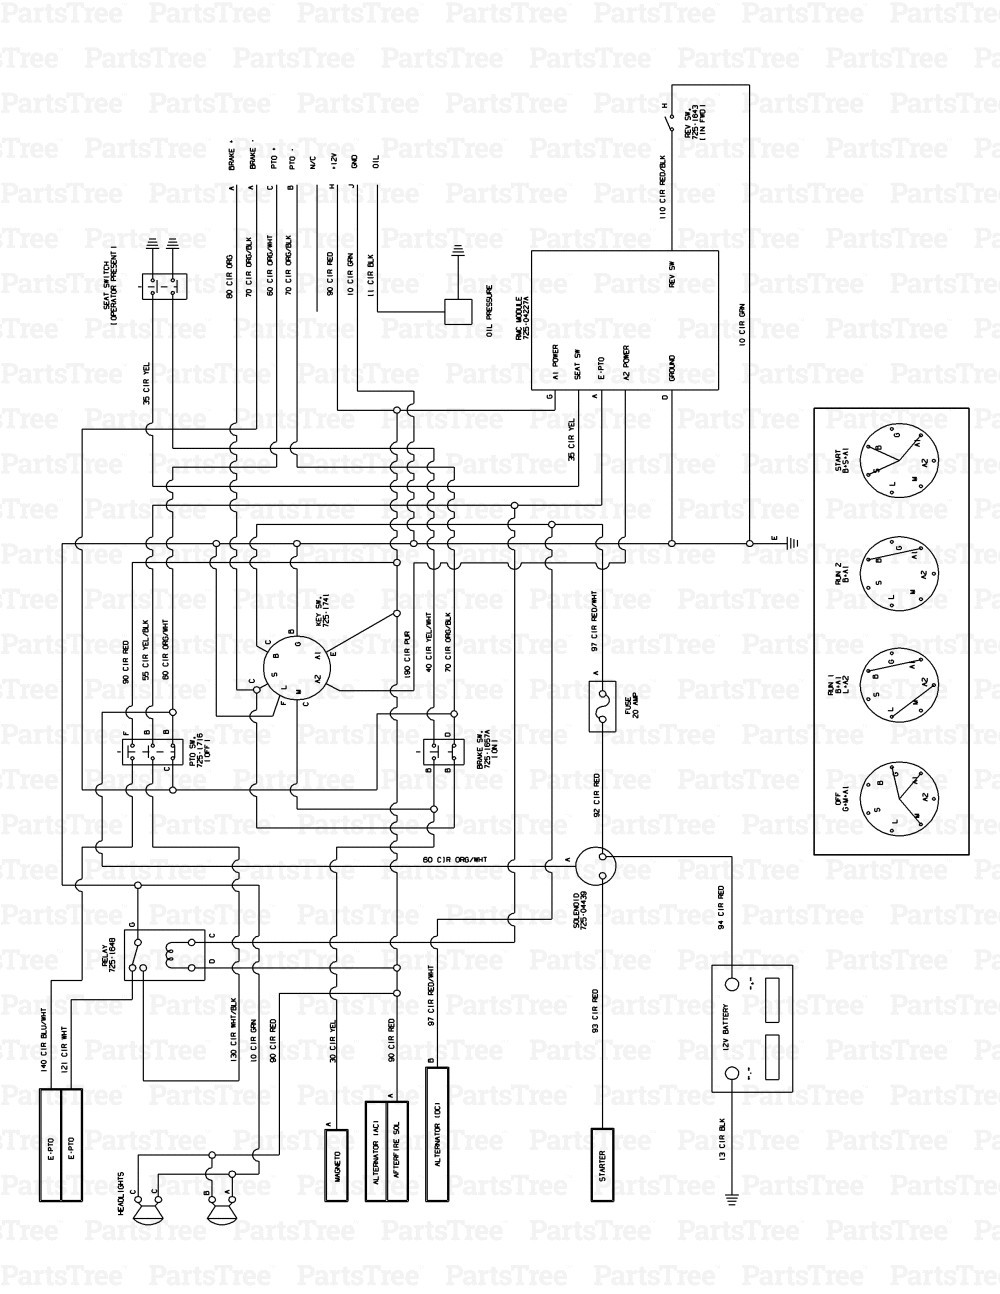 Iplimage Php Ir Random Cub Cadet Gt1554 Wiring Diagram